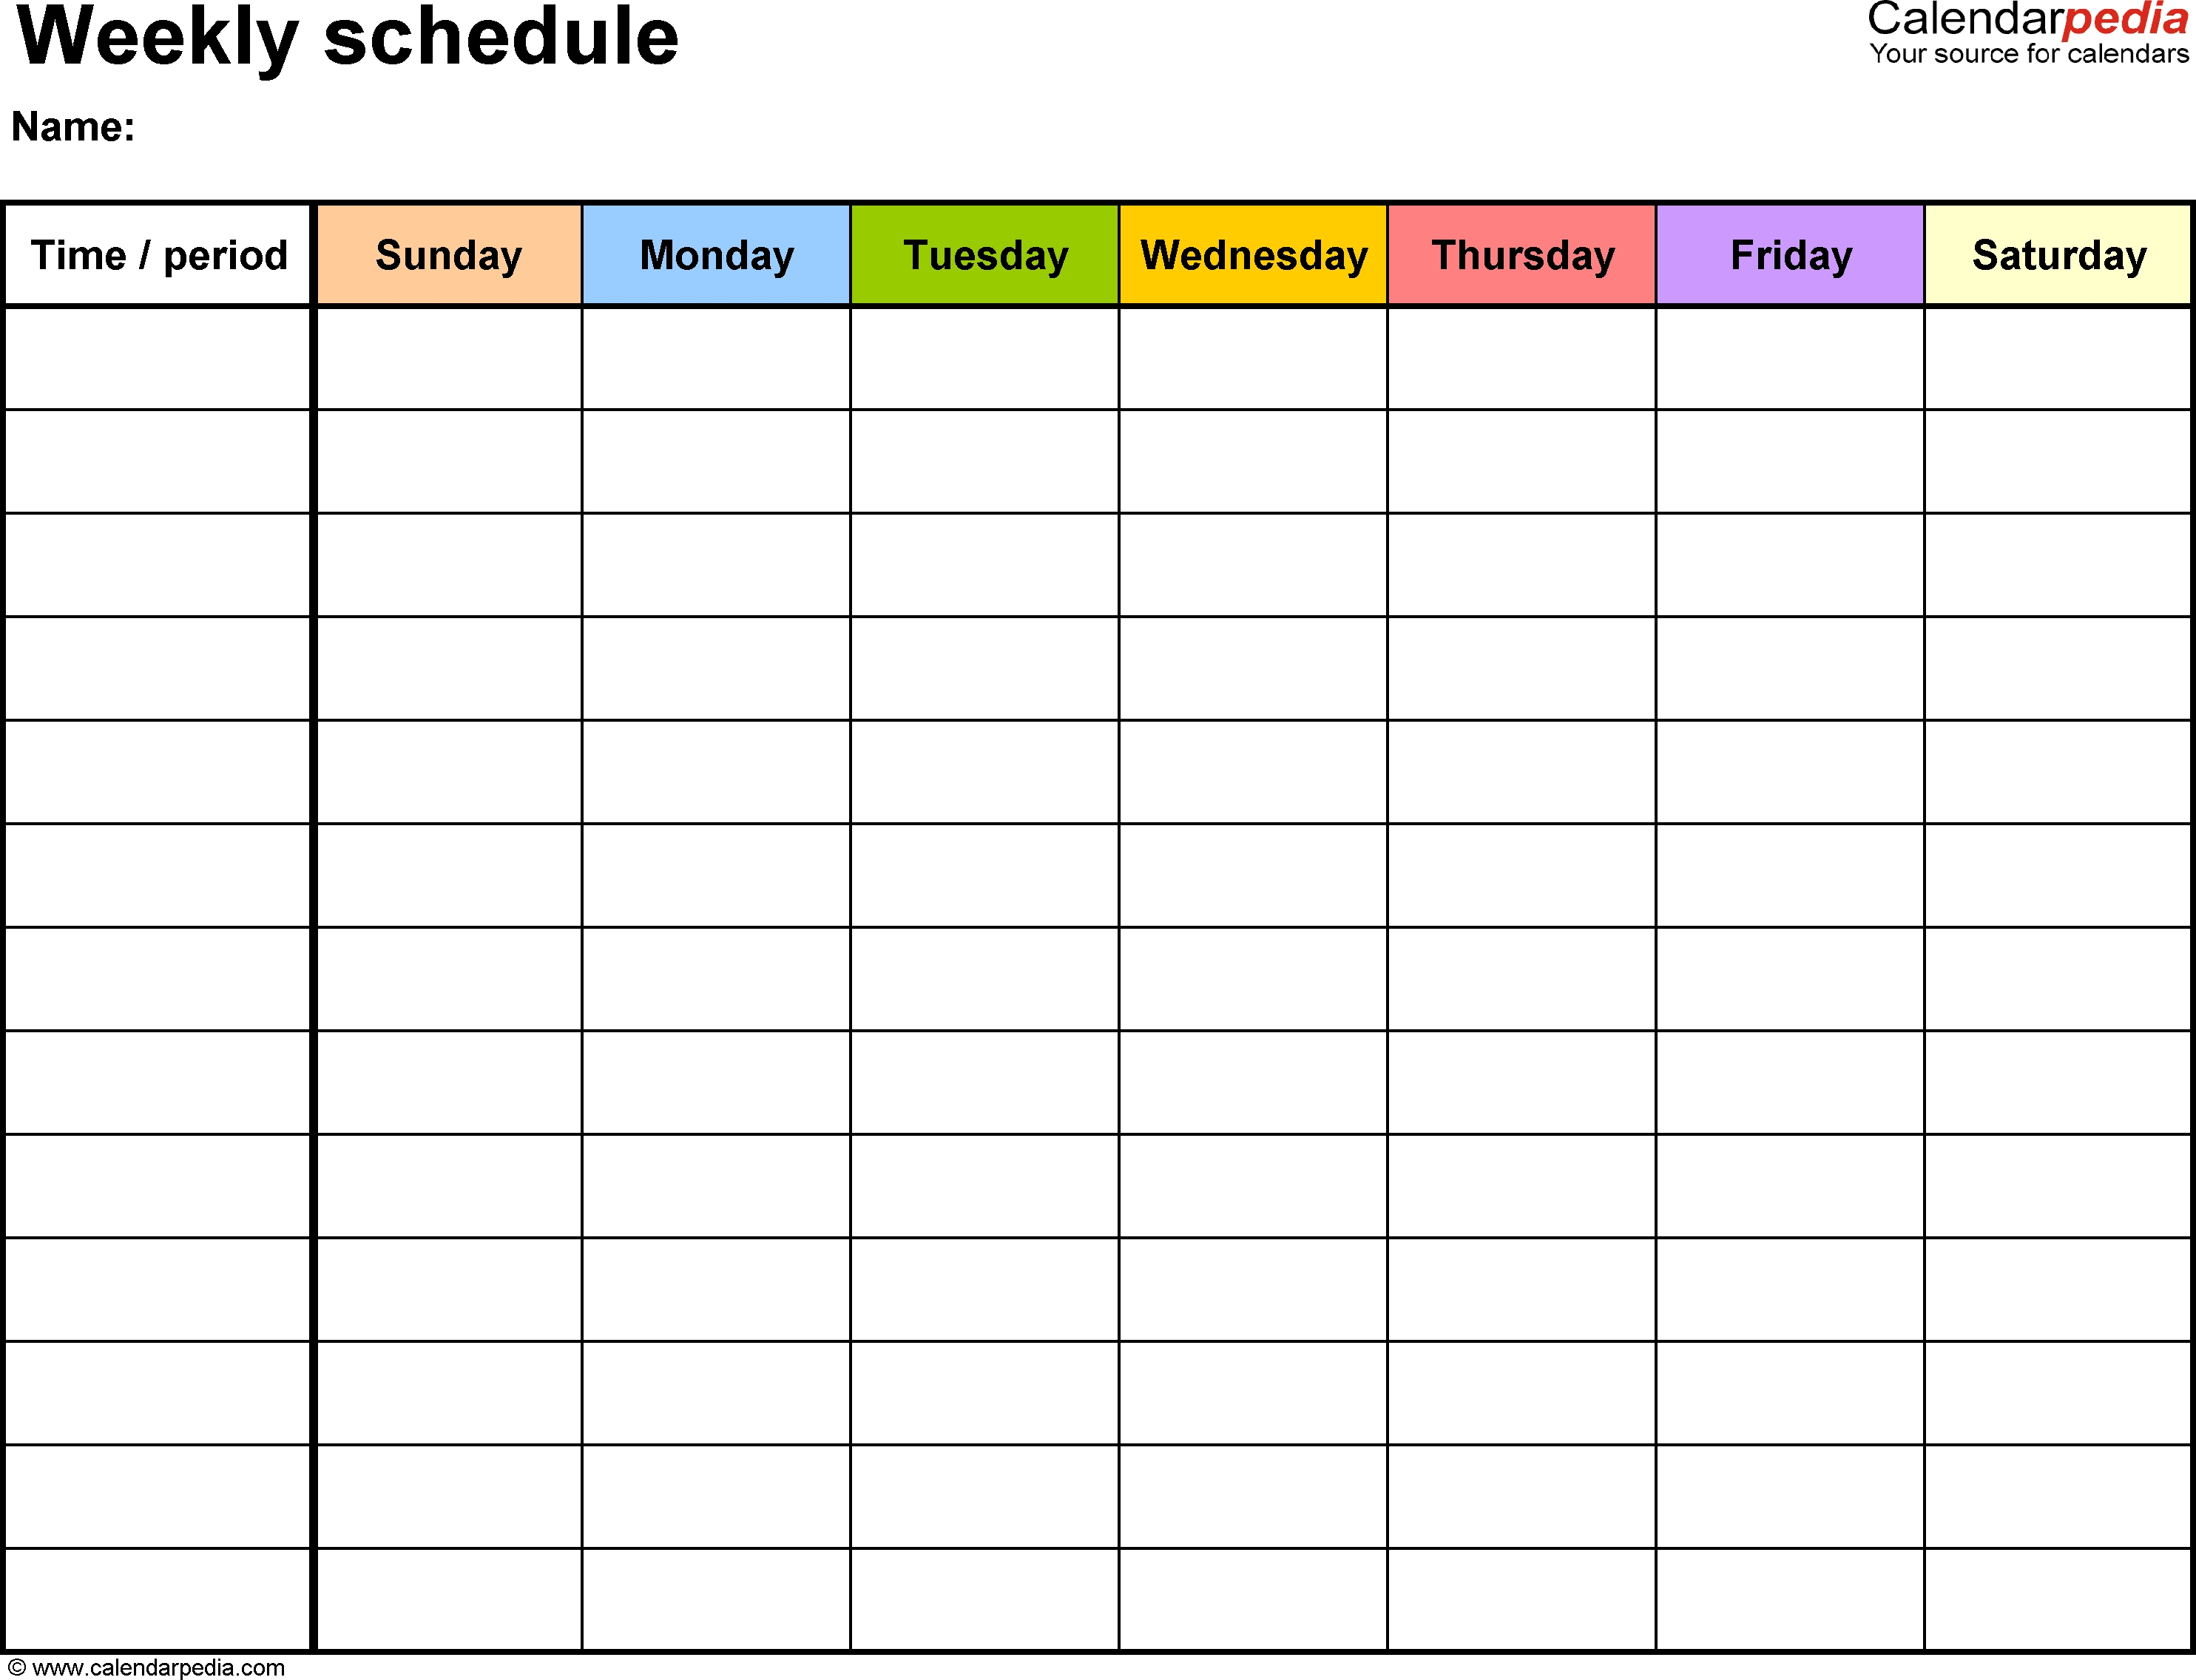 Weekly Schedule Template For Word Version 13: Landscape, 1  Design 7 Days Calendar Pdf